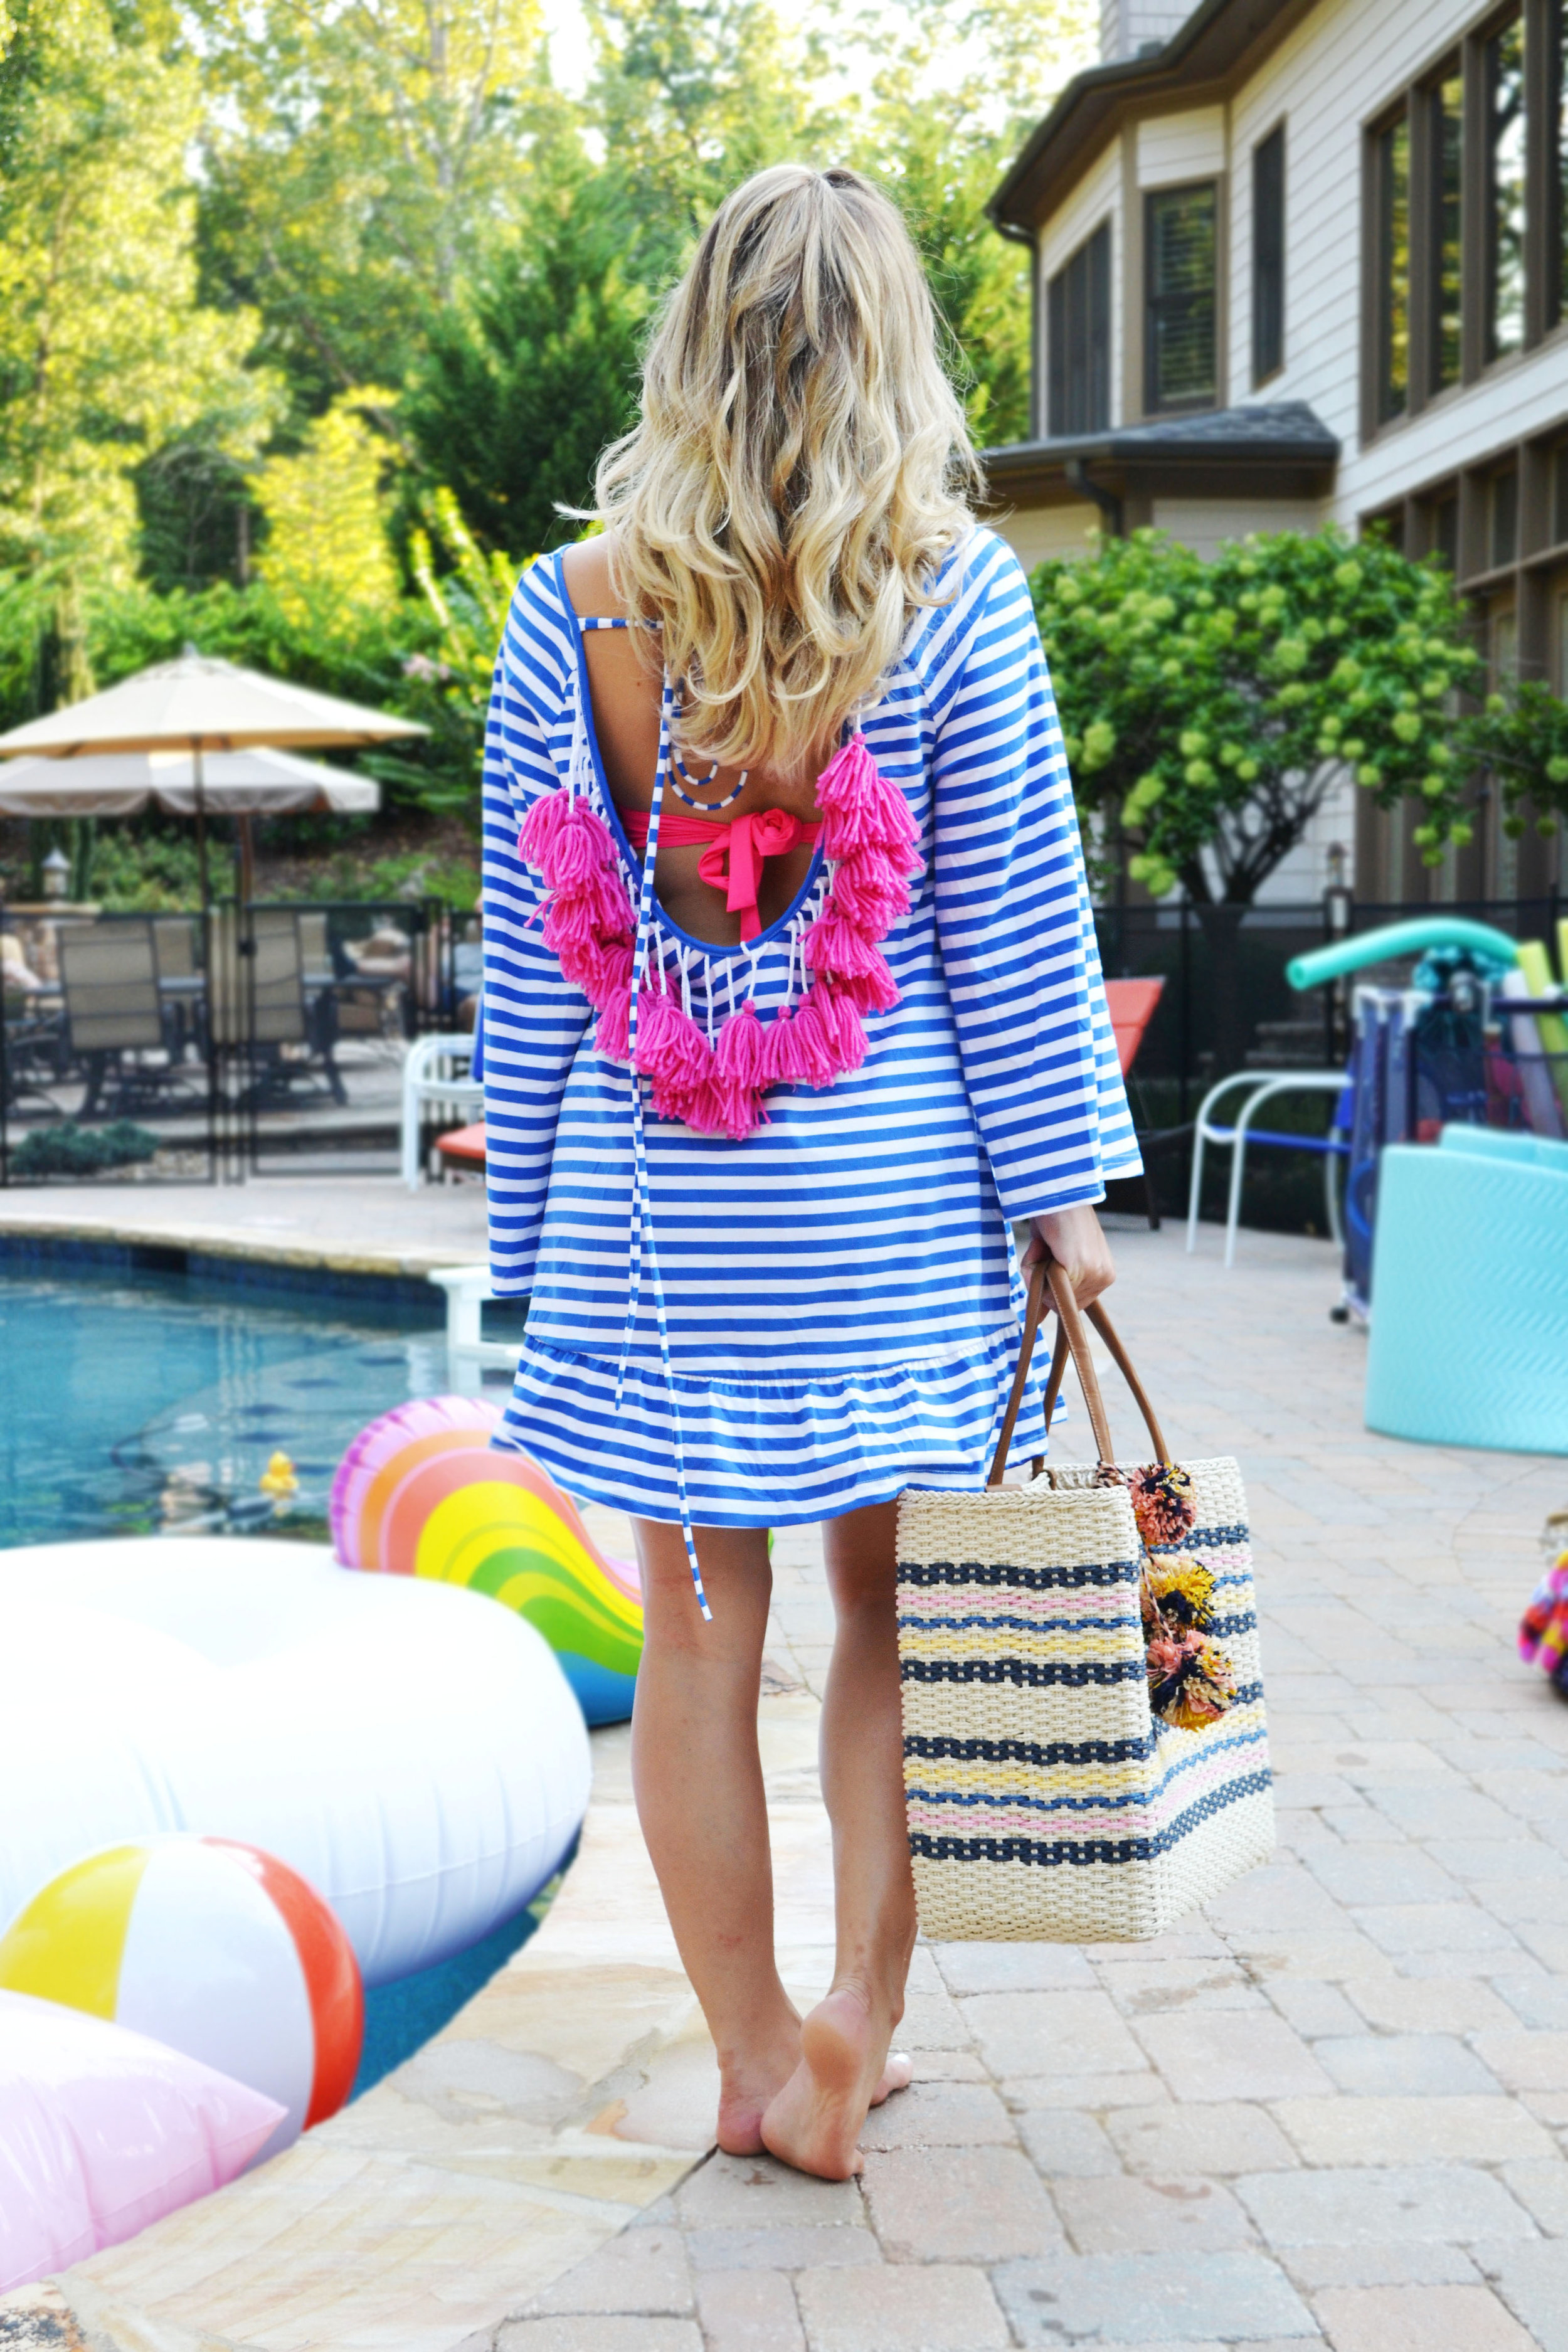 Featuring:  She In Tassel Shift Dress  //   Dillards Pom Pom Tote- Shop Similar   //  Unicorn Pool Float